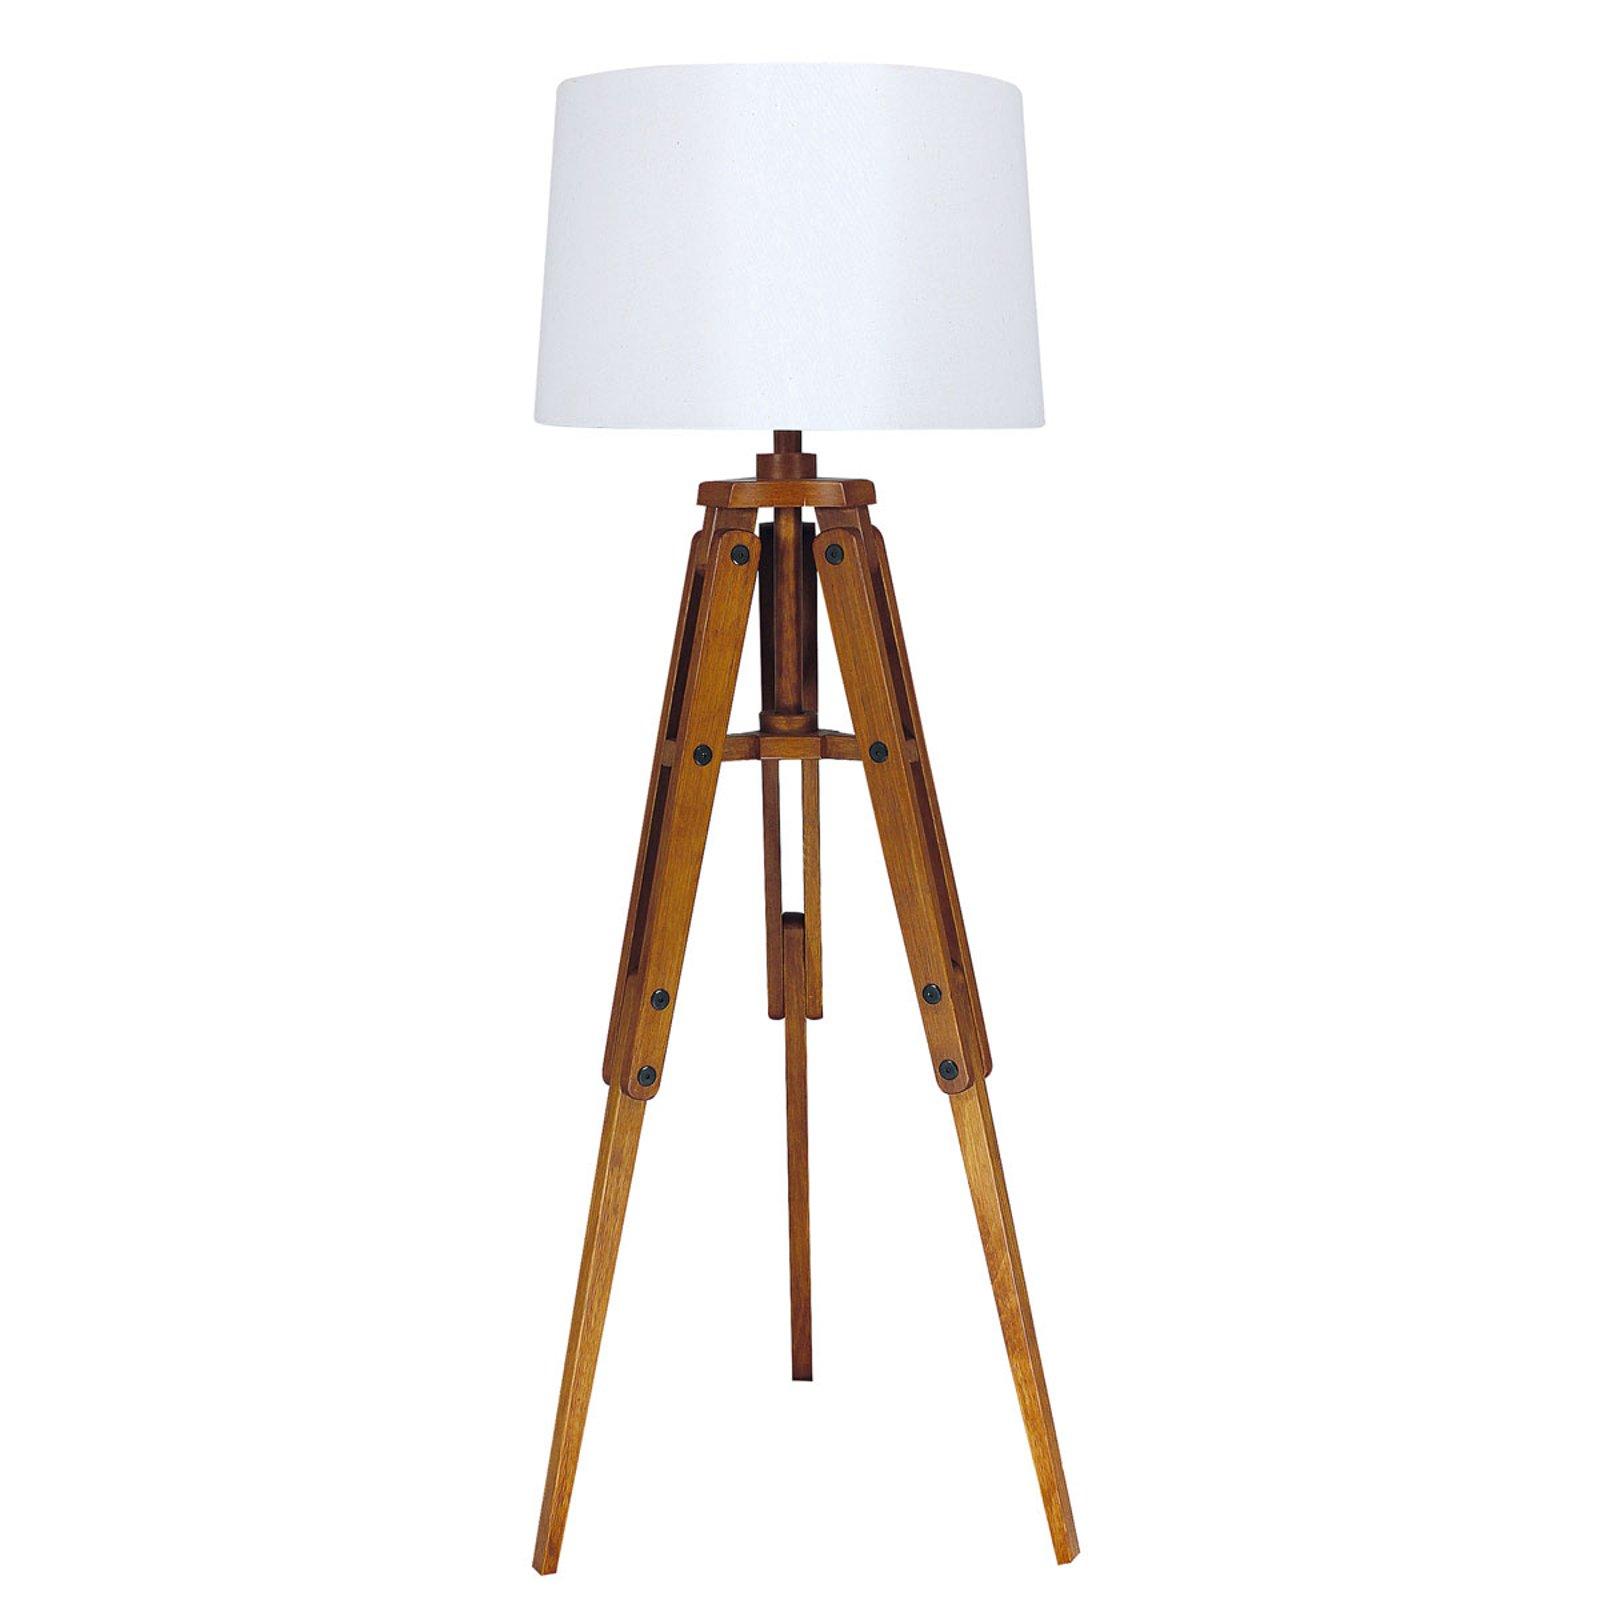 Tre-gulvlampe Marvin i stativform, høyde 122 cm